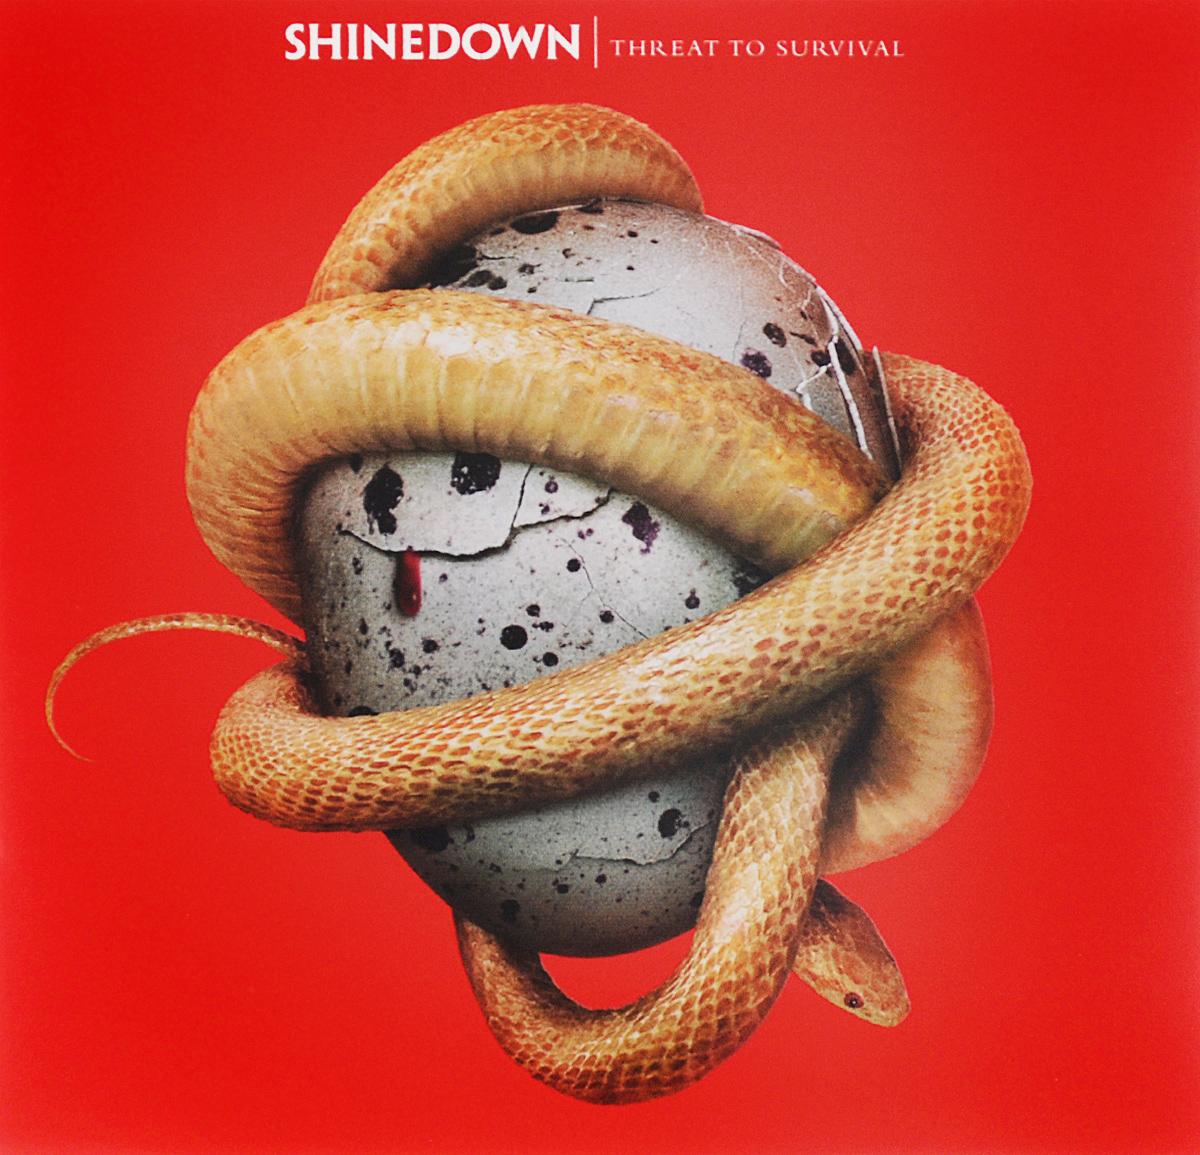 Shinedown Shinedown. Threat To Survival shinedown oslo